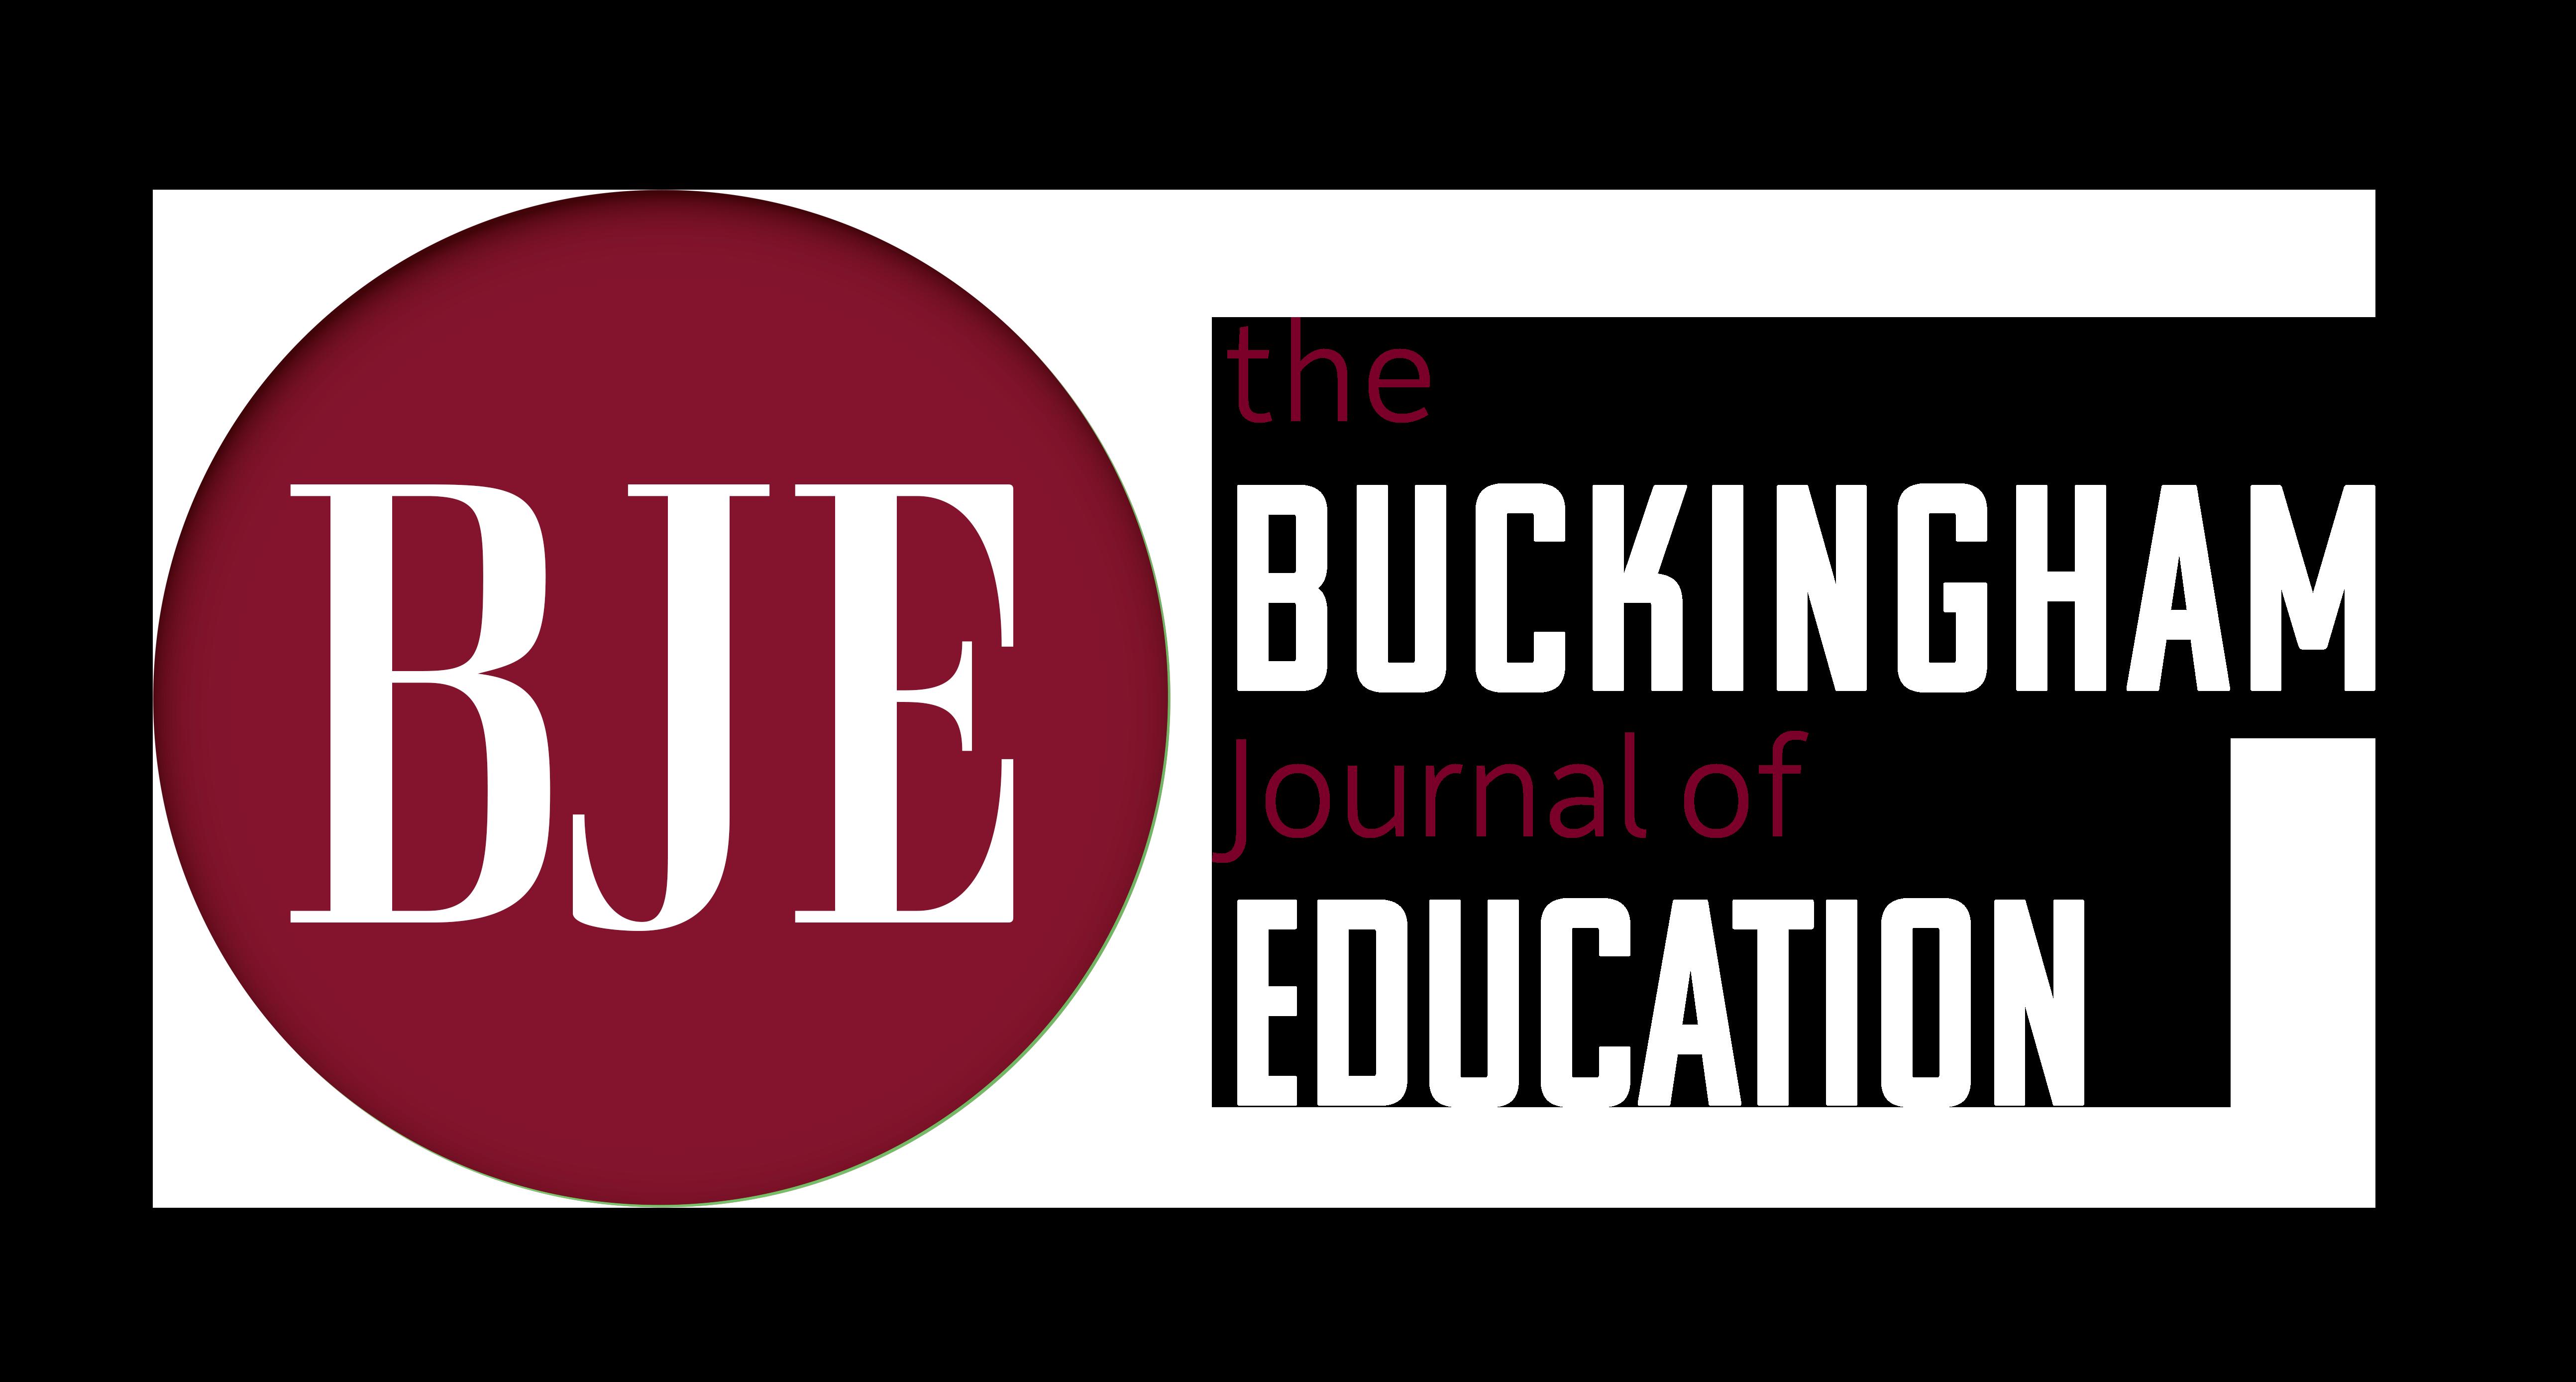 The Buckingham Journal of Education